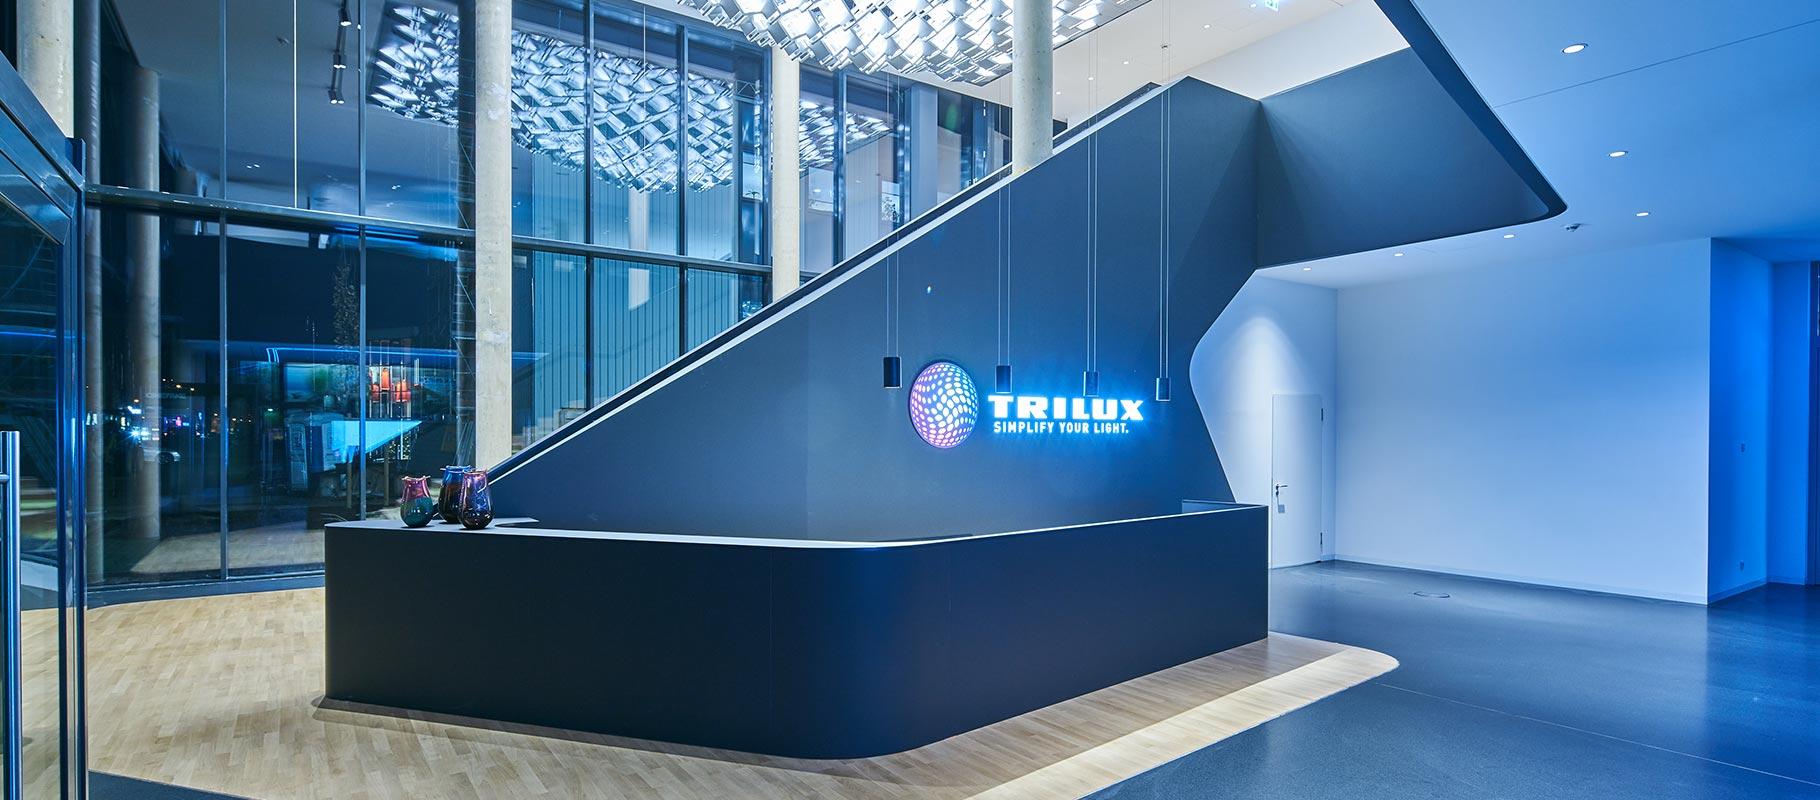 Parkplatzbeleuchtung   TRILUX